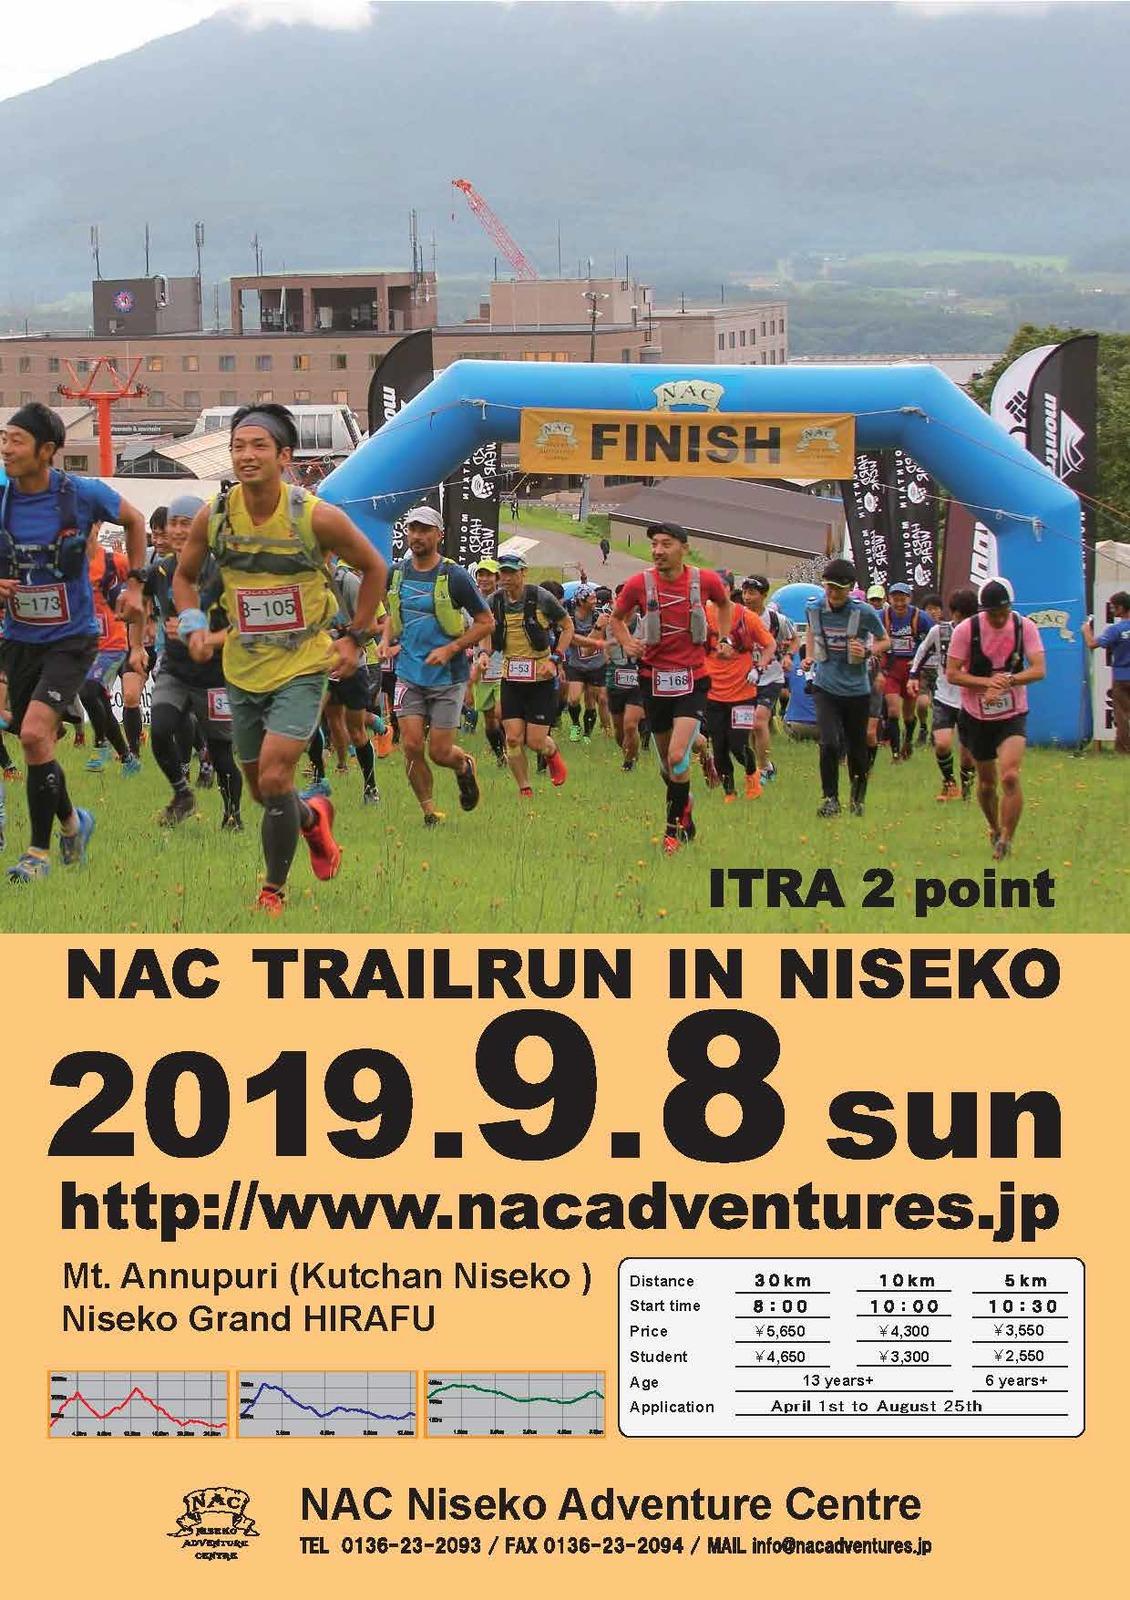 nac trail run niseko